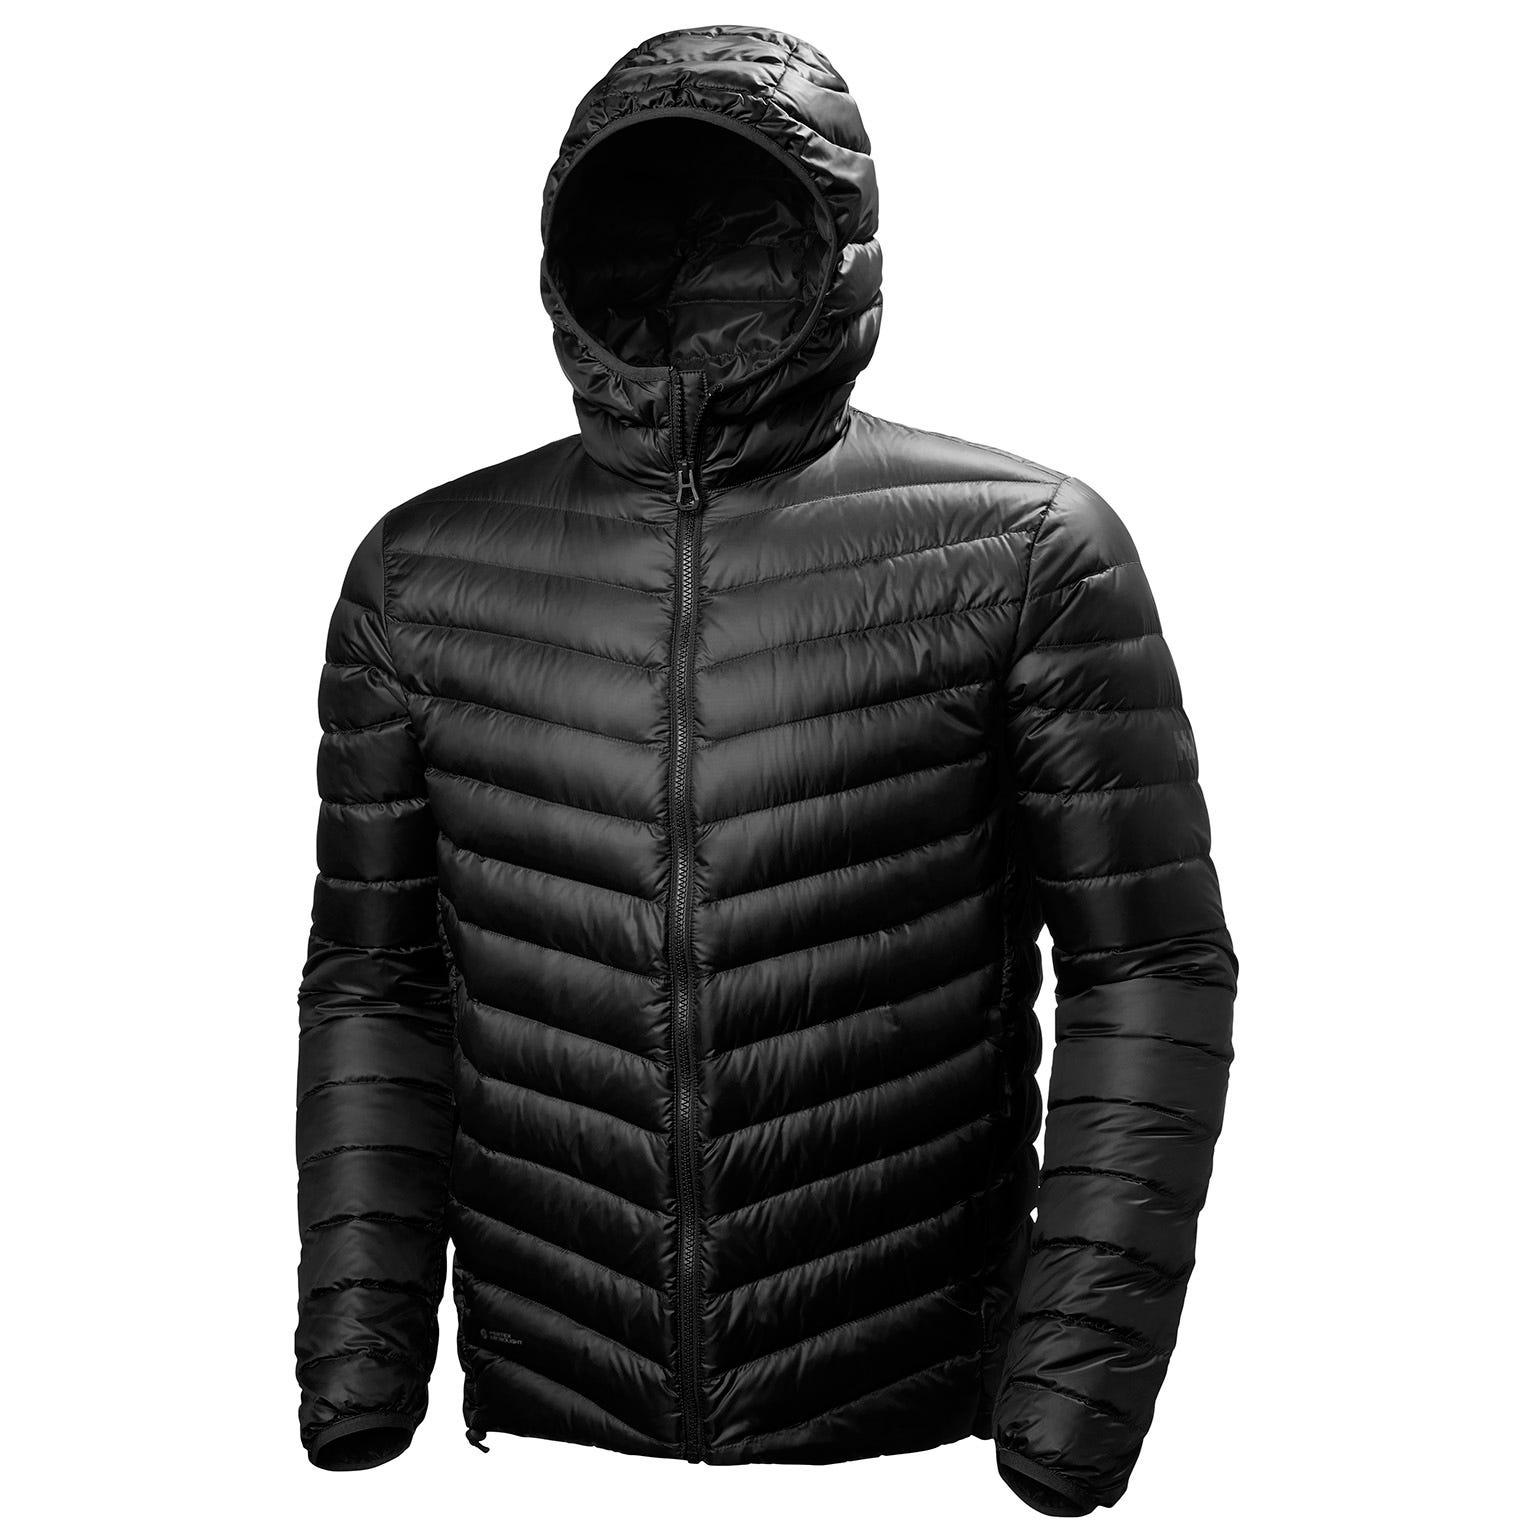 Helly Hansen Verglas Hooded Down Insulator Mens Hiking Jacket Black M